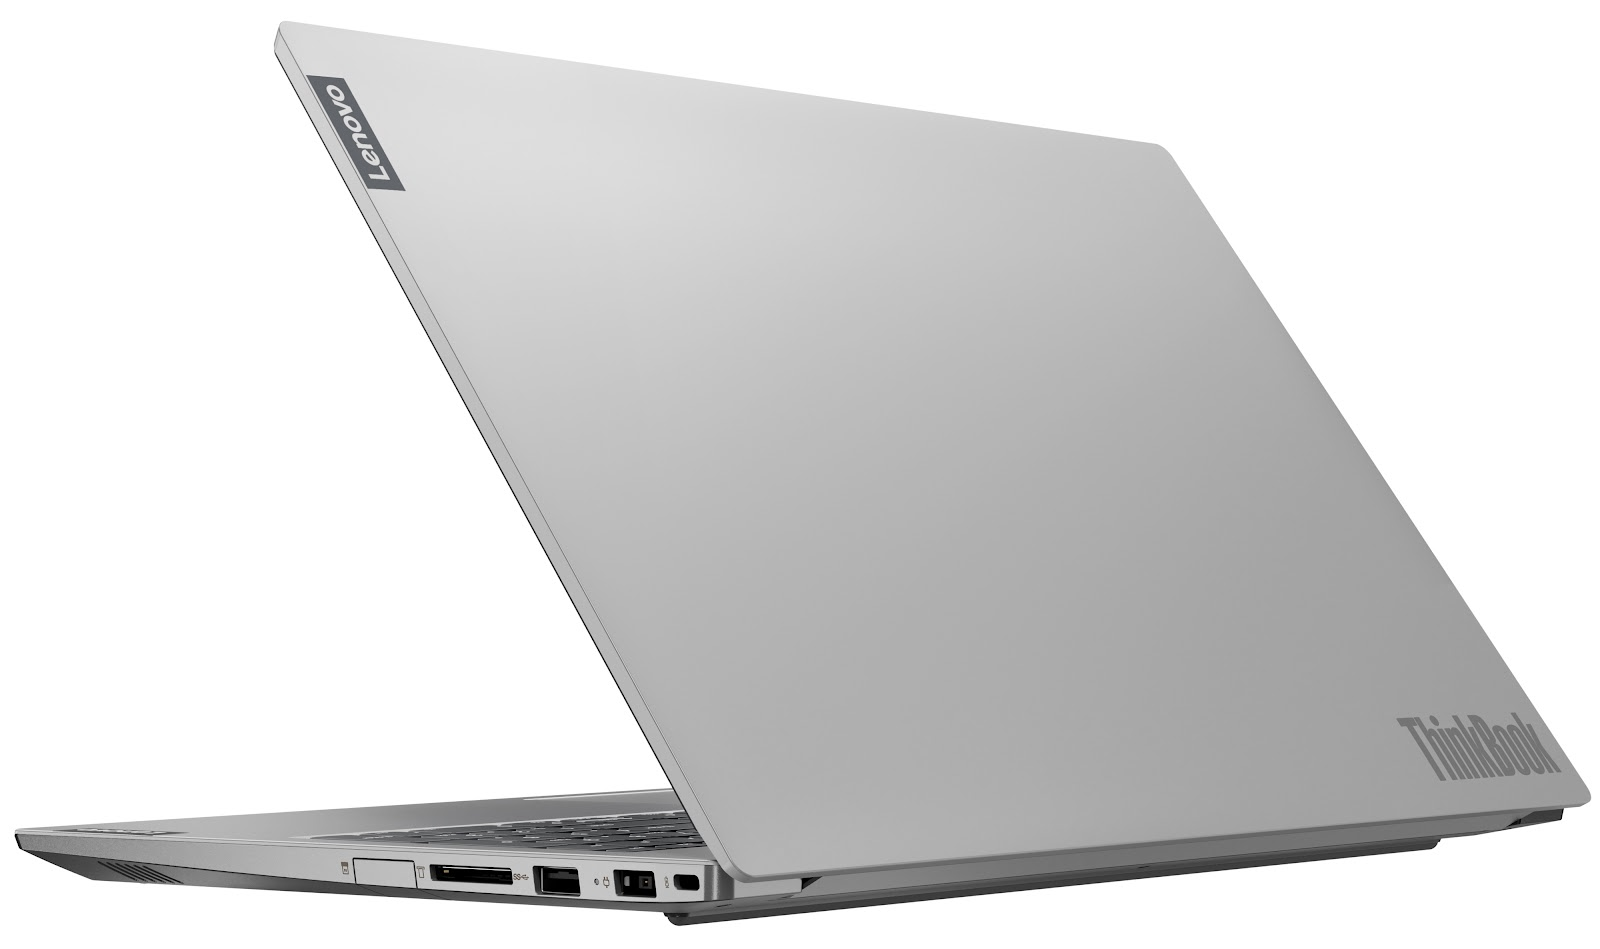 Фото 1. Ноутбук Lenovo ThinkBook 15-IIL (20SM003WRU)